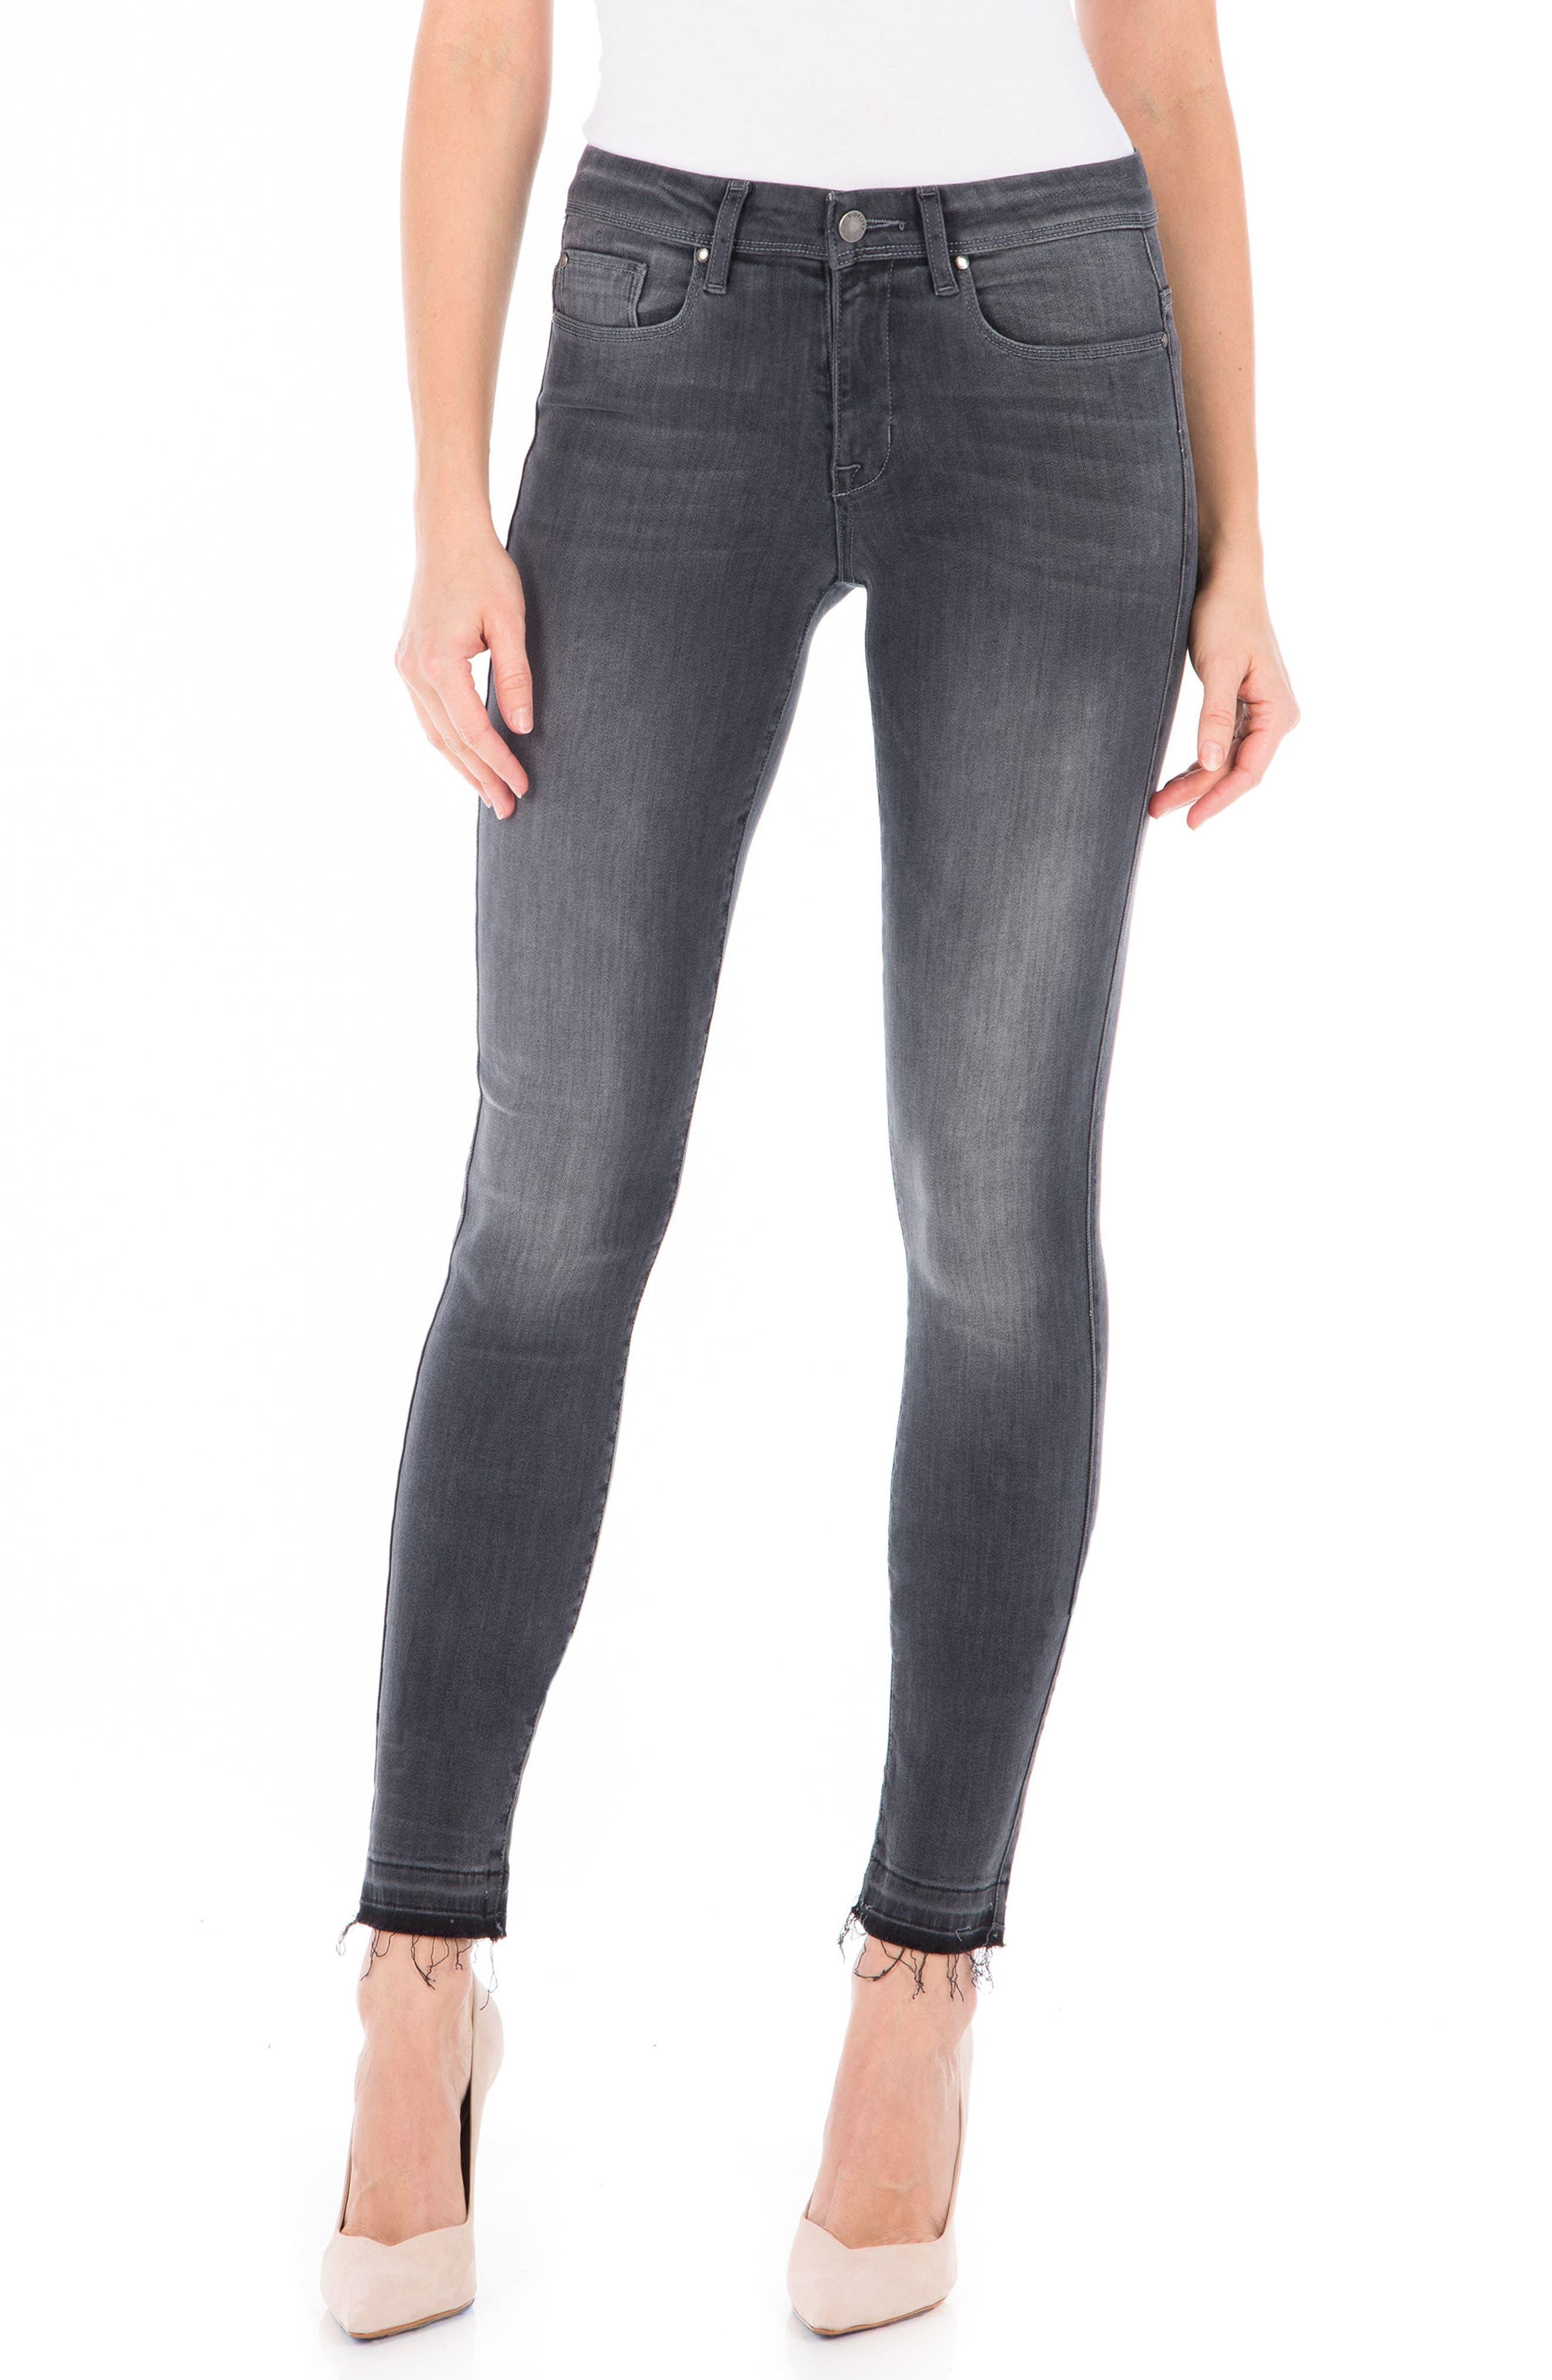 Fidelity Denim Gwen High Waist Skinny Jeans (Mystic Black)